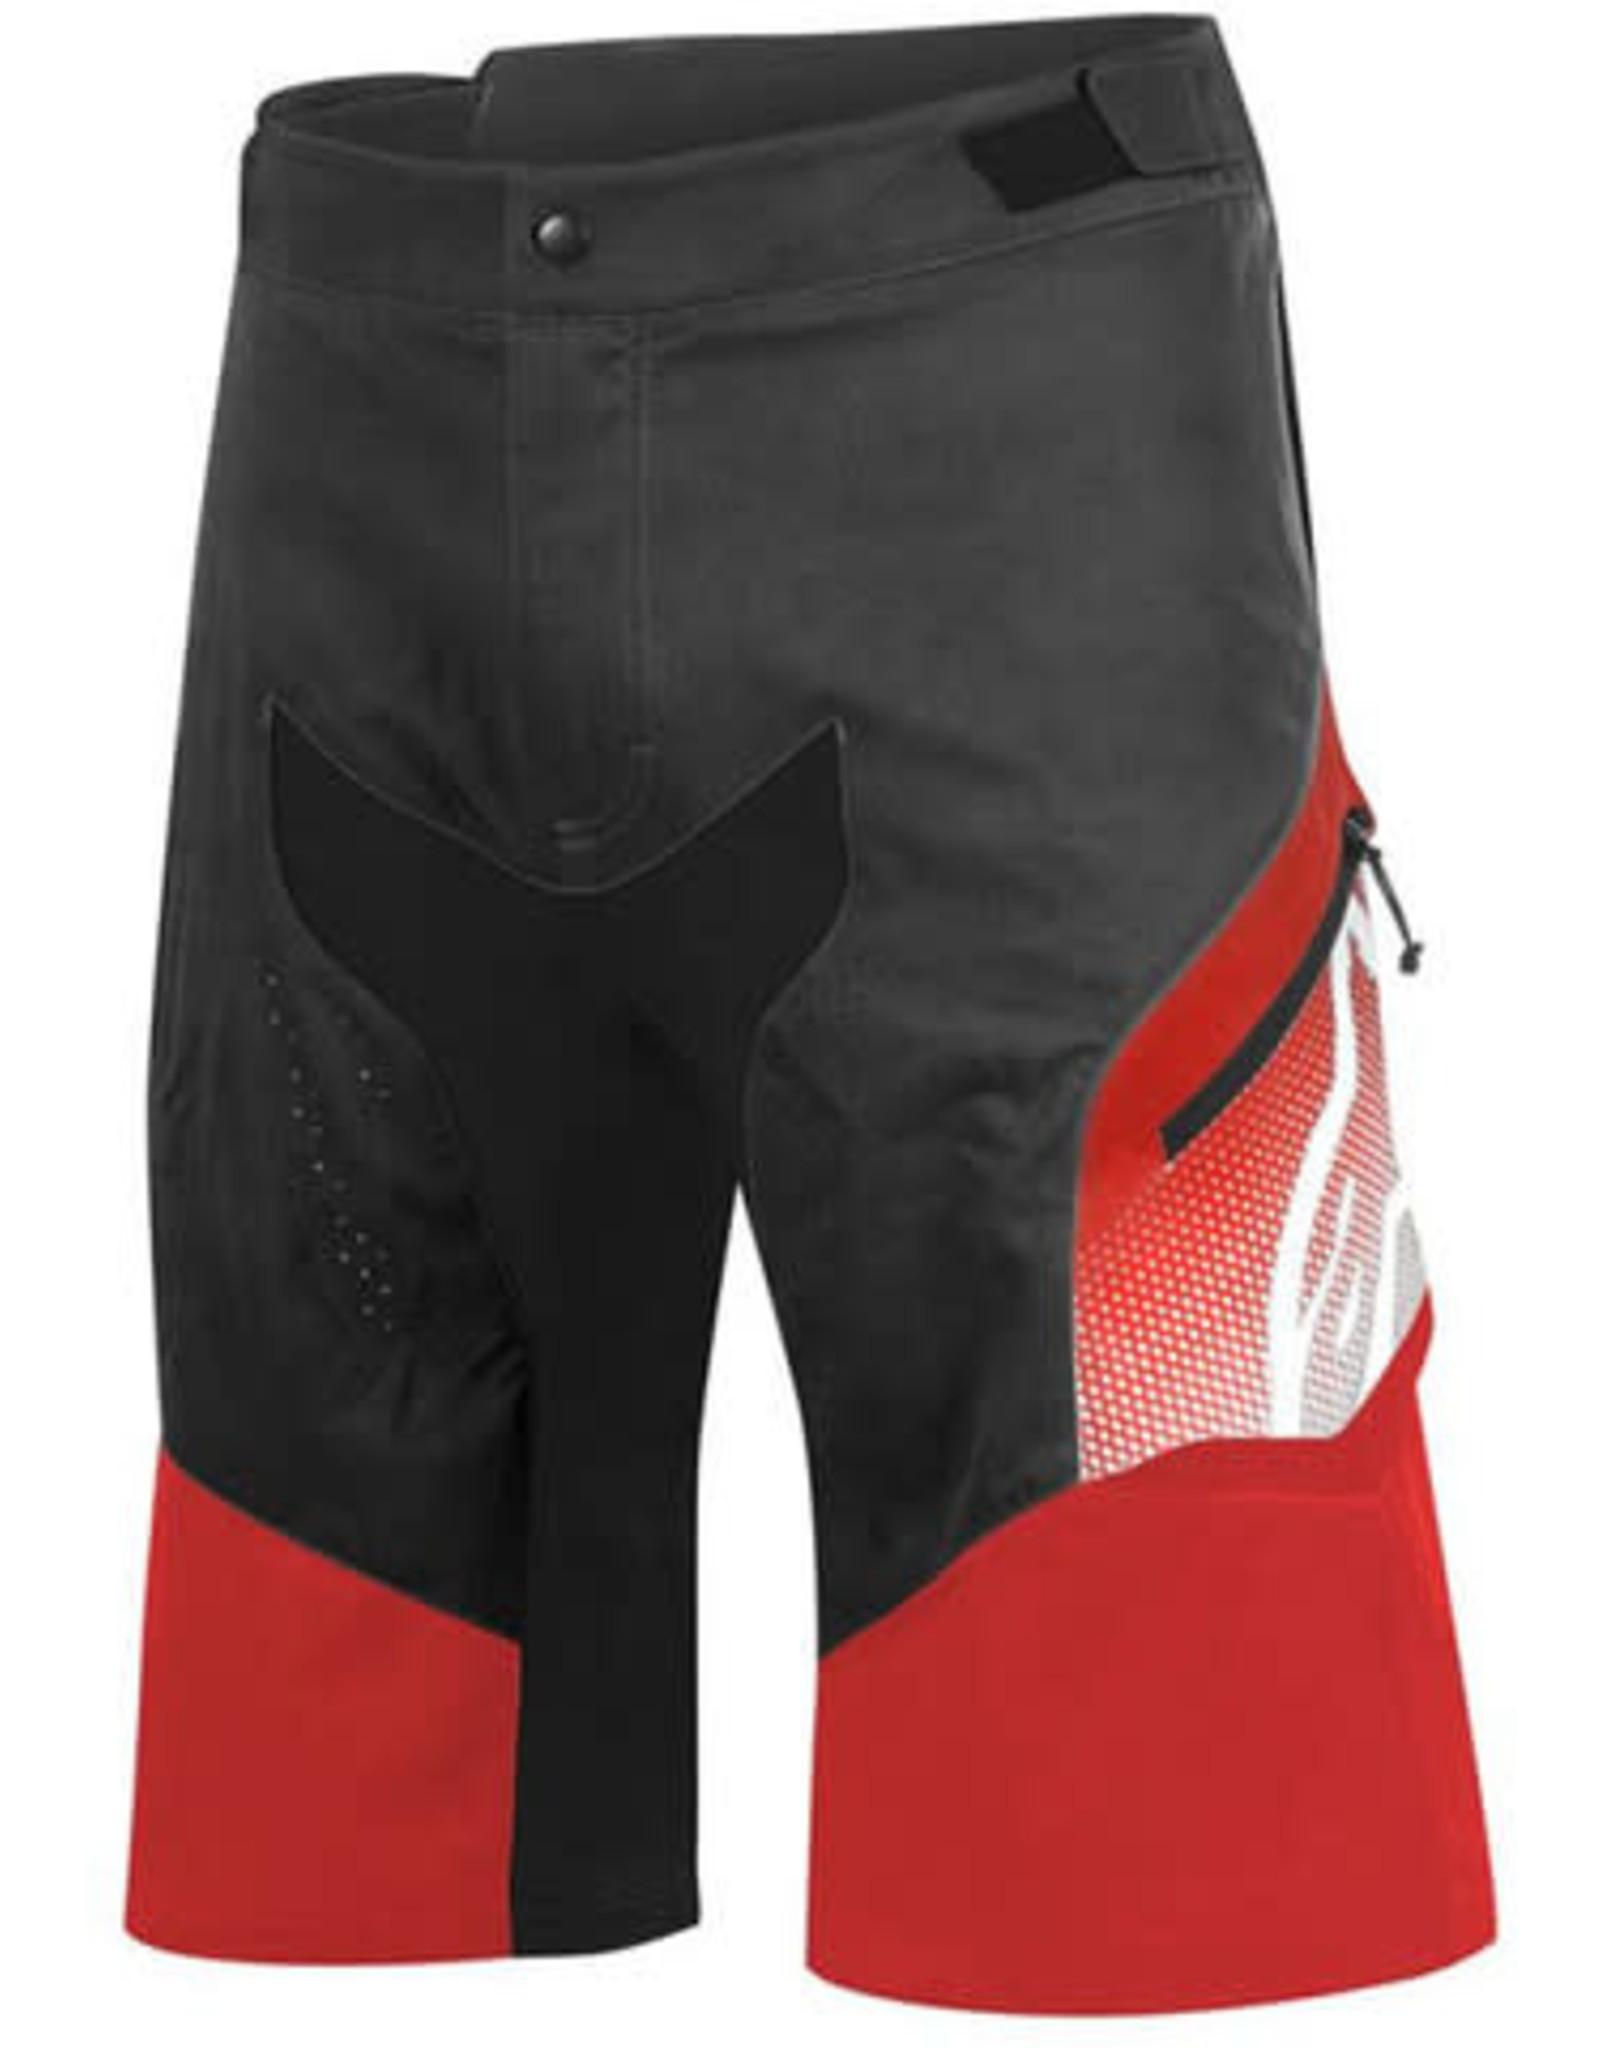 Alpinestar Predator Shorts